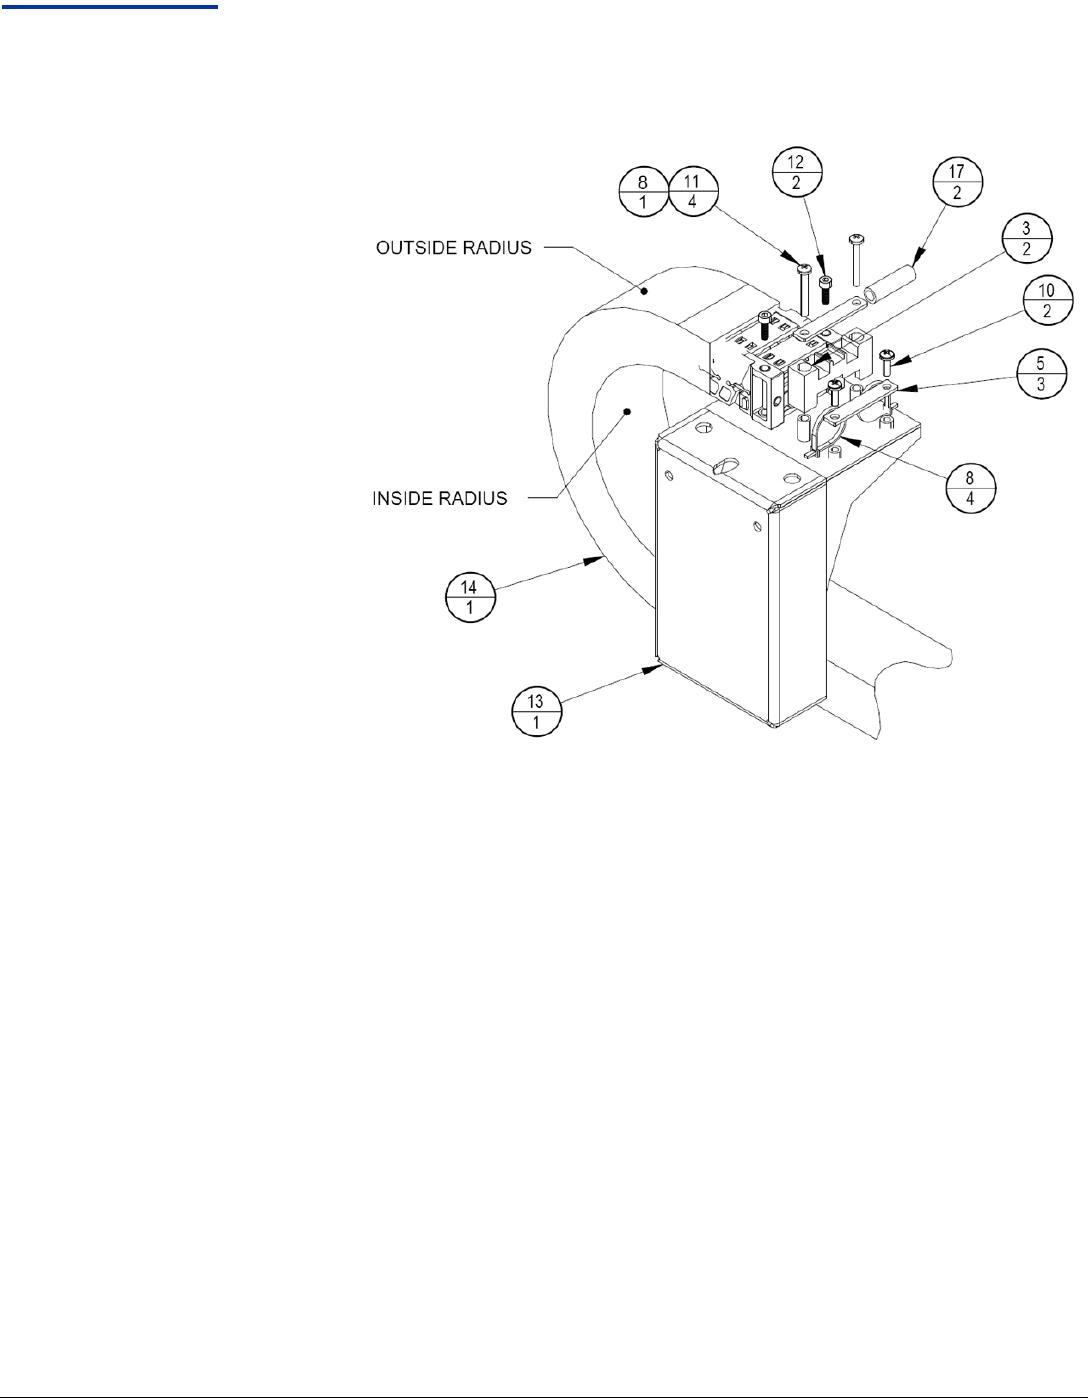 Part No. CQ114-90035 Rev B HP Scitex FB500   FB700 Service Manual Page 52  of 510 12a5942e9ae90